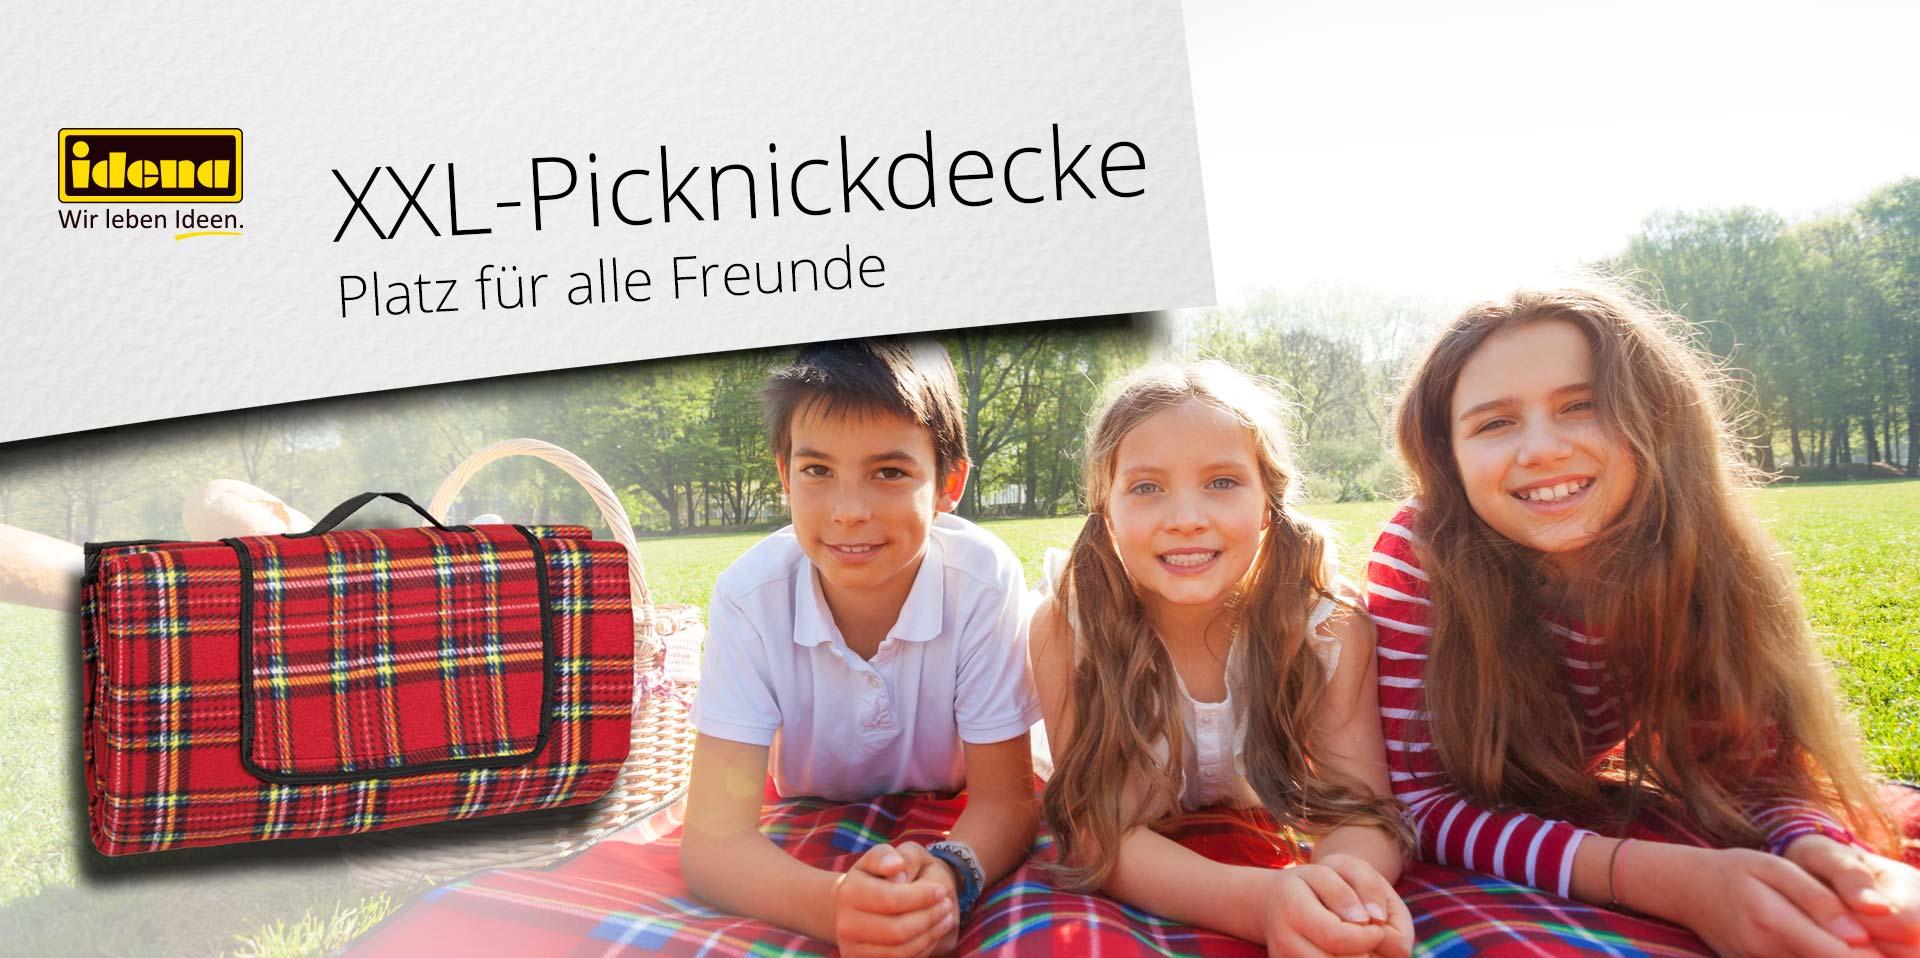 Banner XXL Picknickdecke